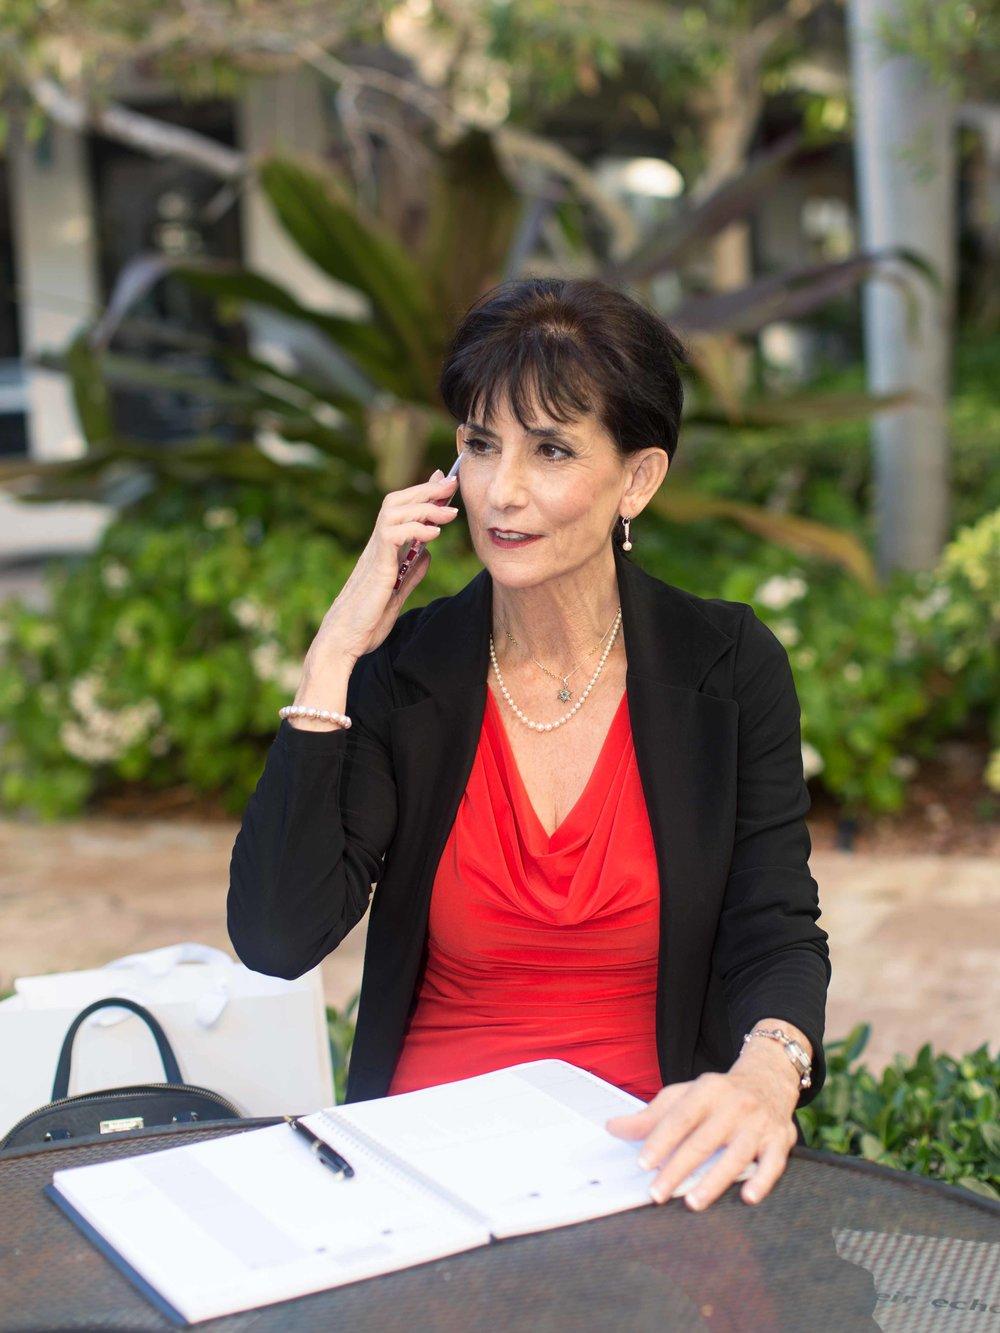 personal-branding-photography-realtor-red-dress-black-blazer-fort-lauderdale-south-florida